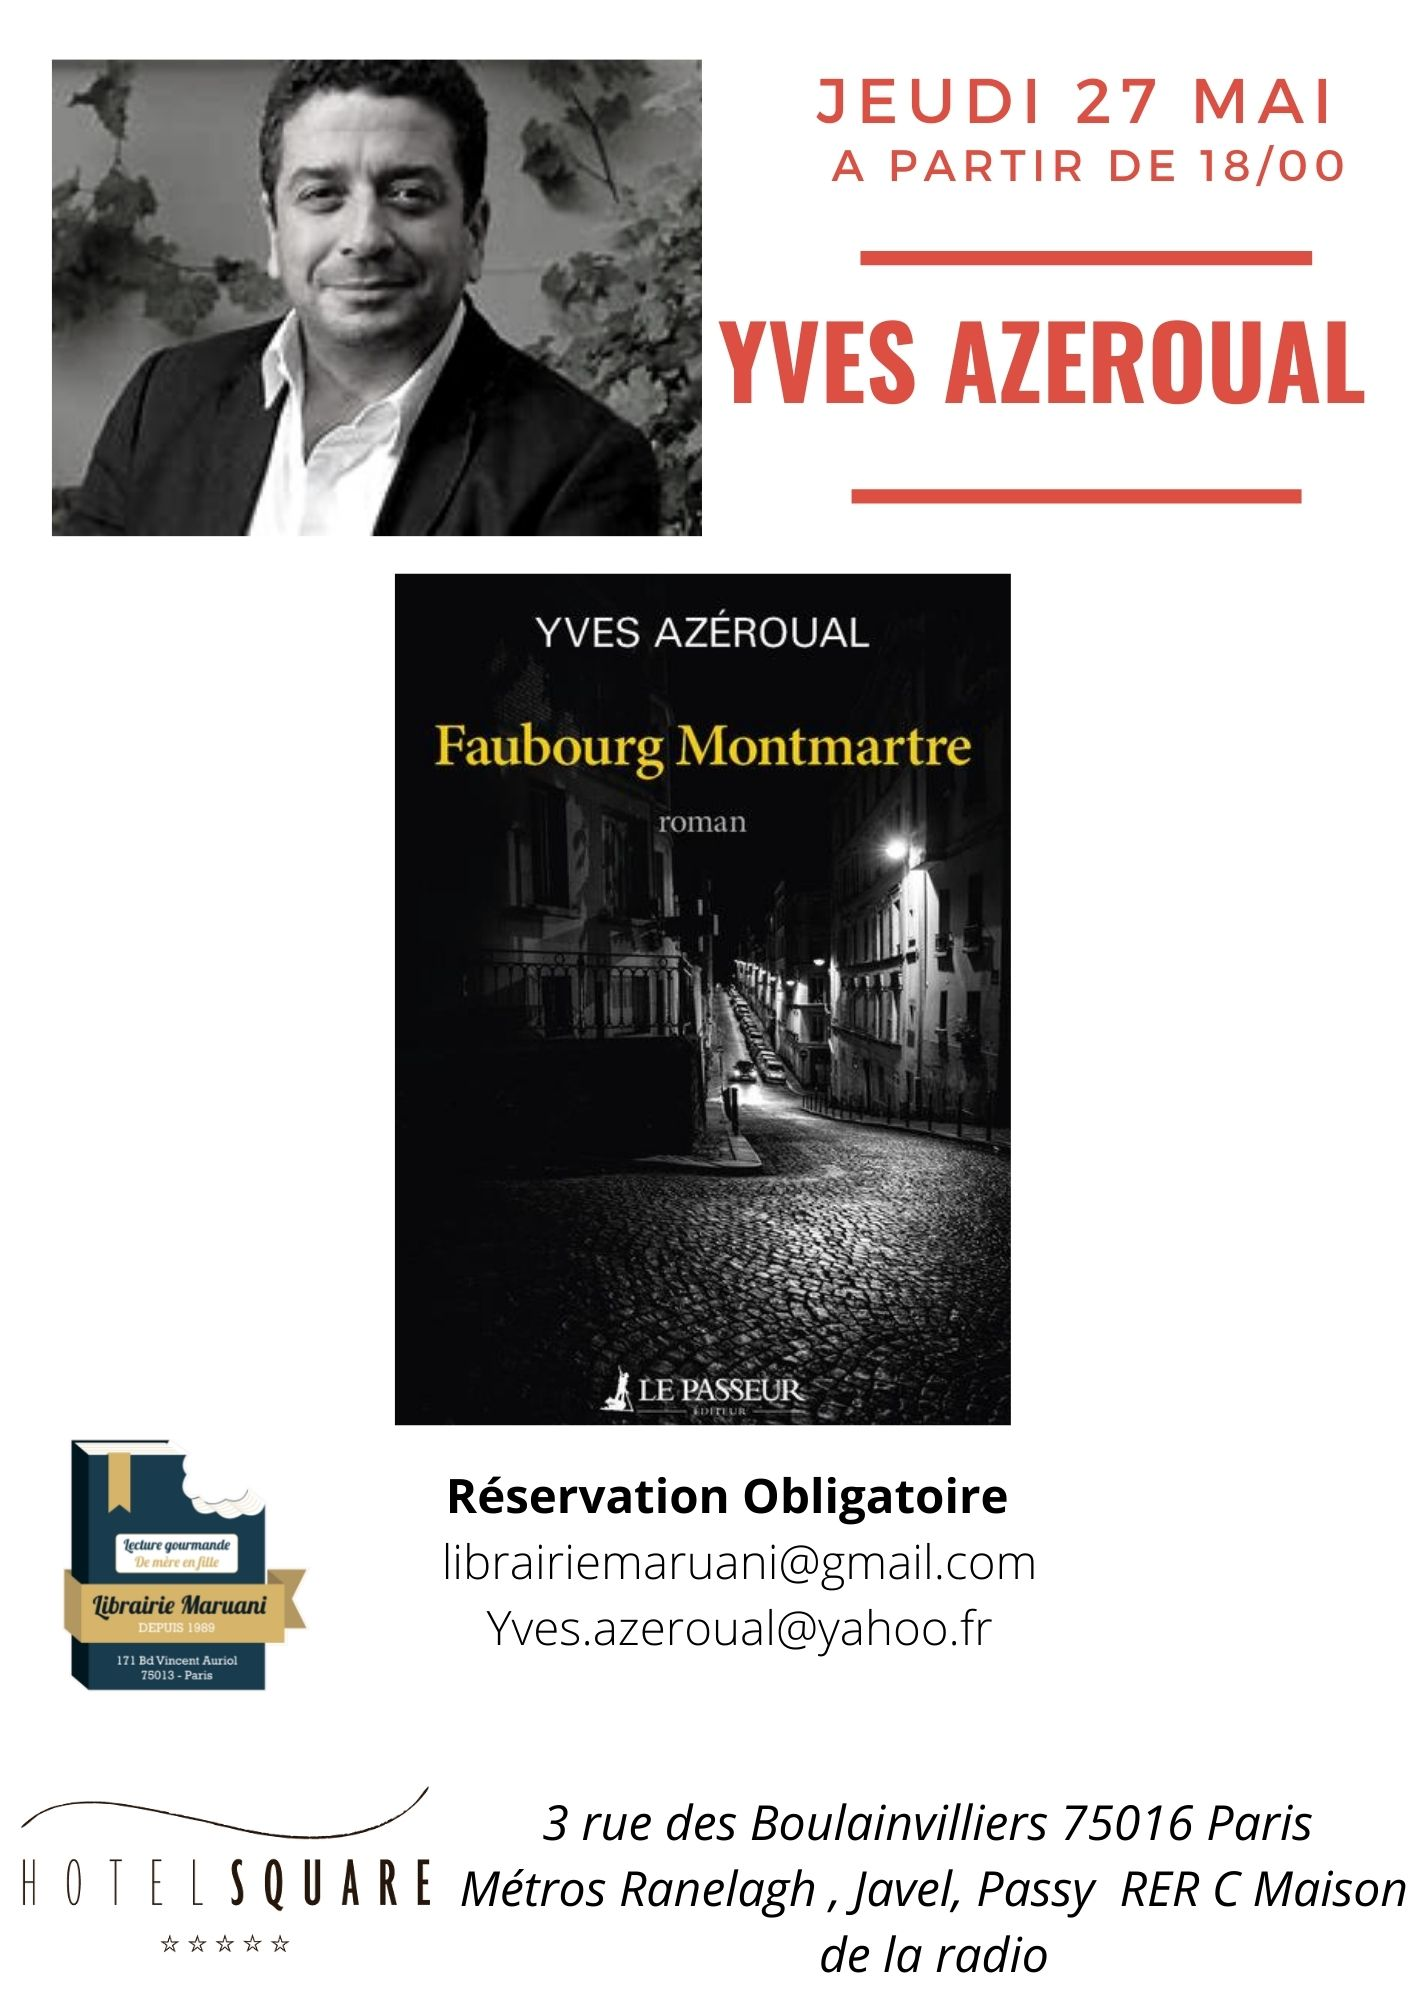 HORS LES MURS : Yves Azeroual